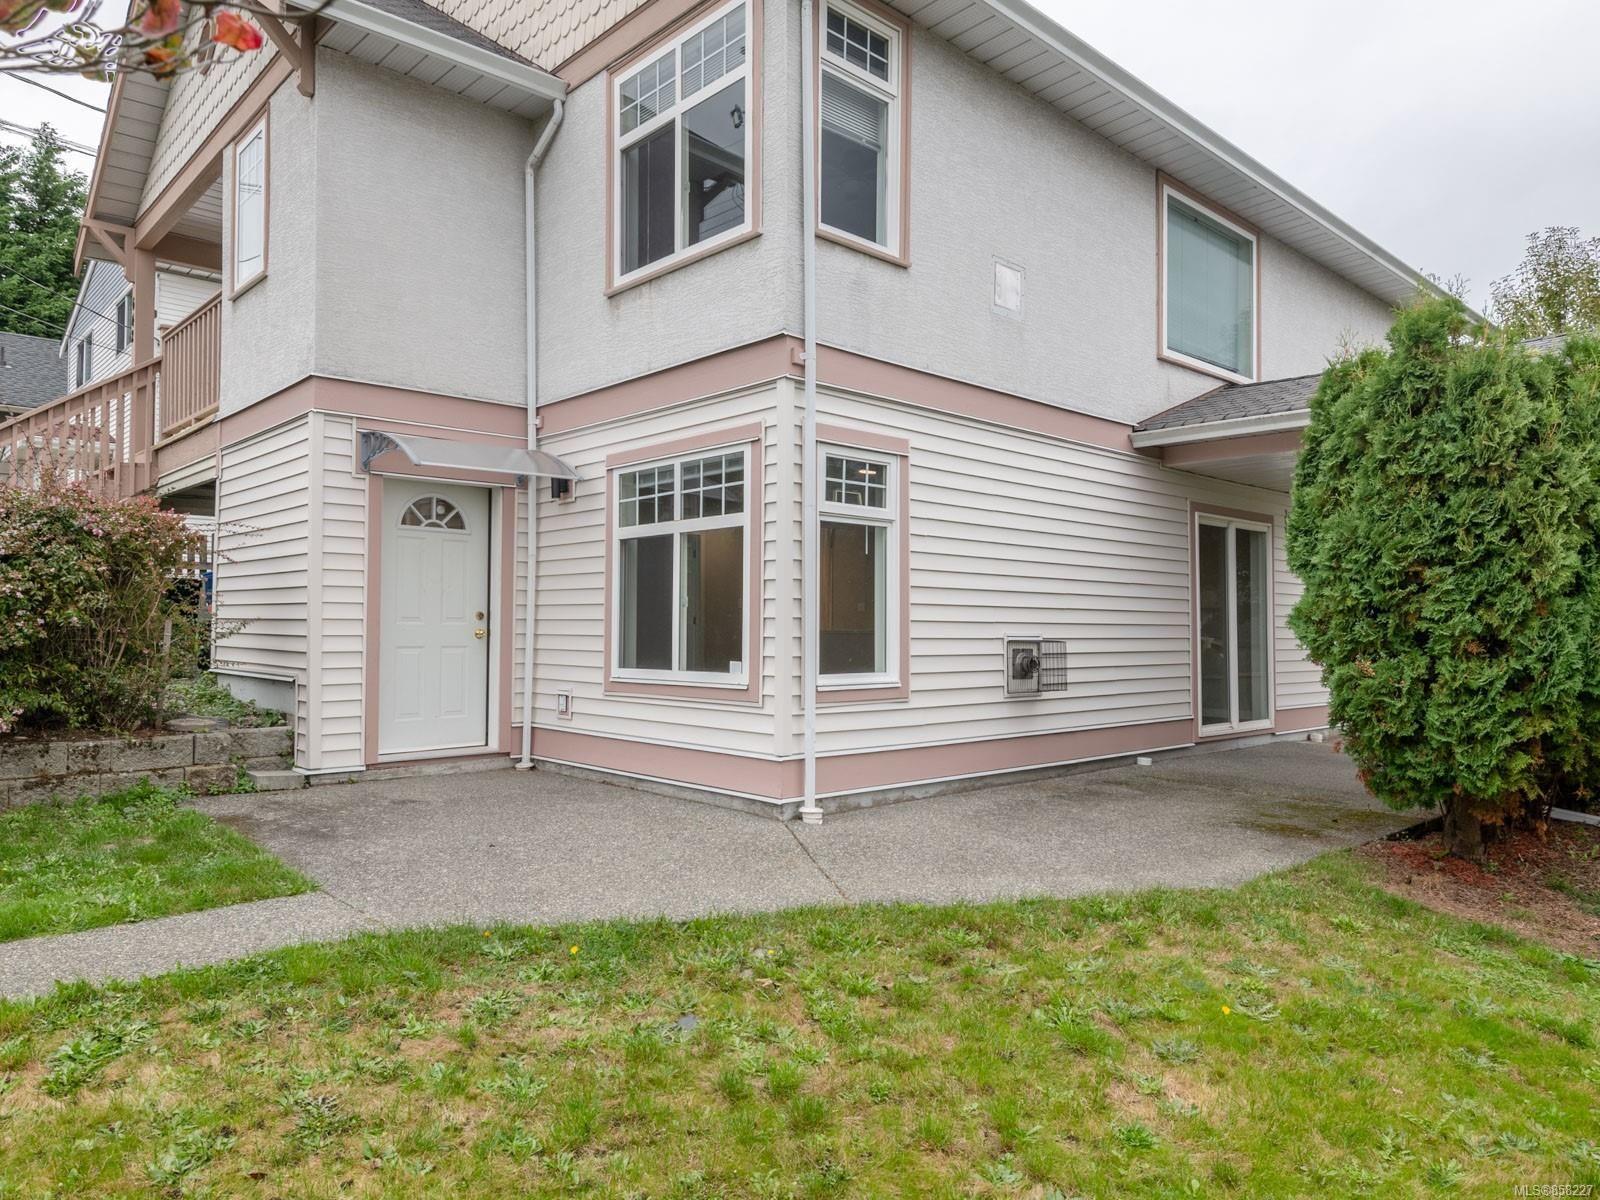 Main Photo: 640 MILTON St in : Na Old City Half Duplex for sale (Nanaimo)  : MLS®# 858227